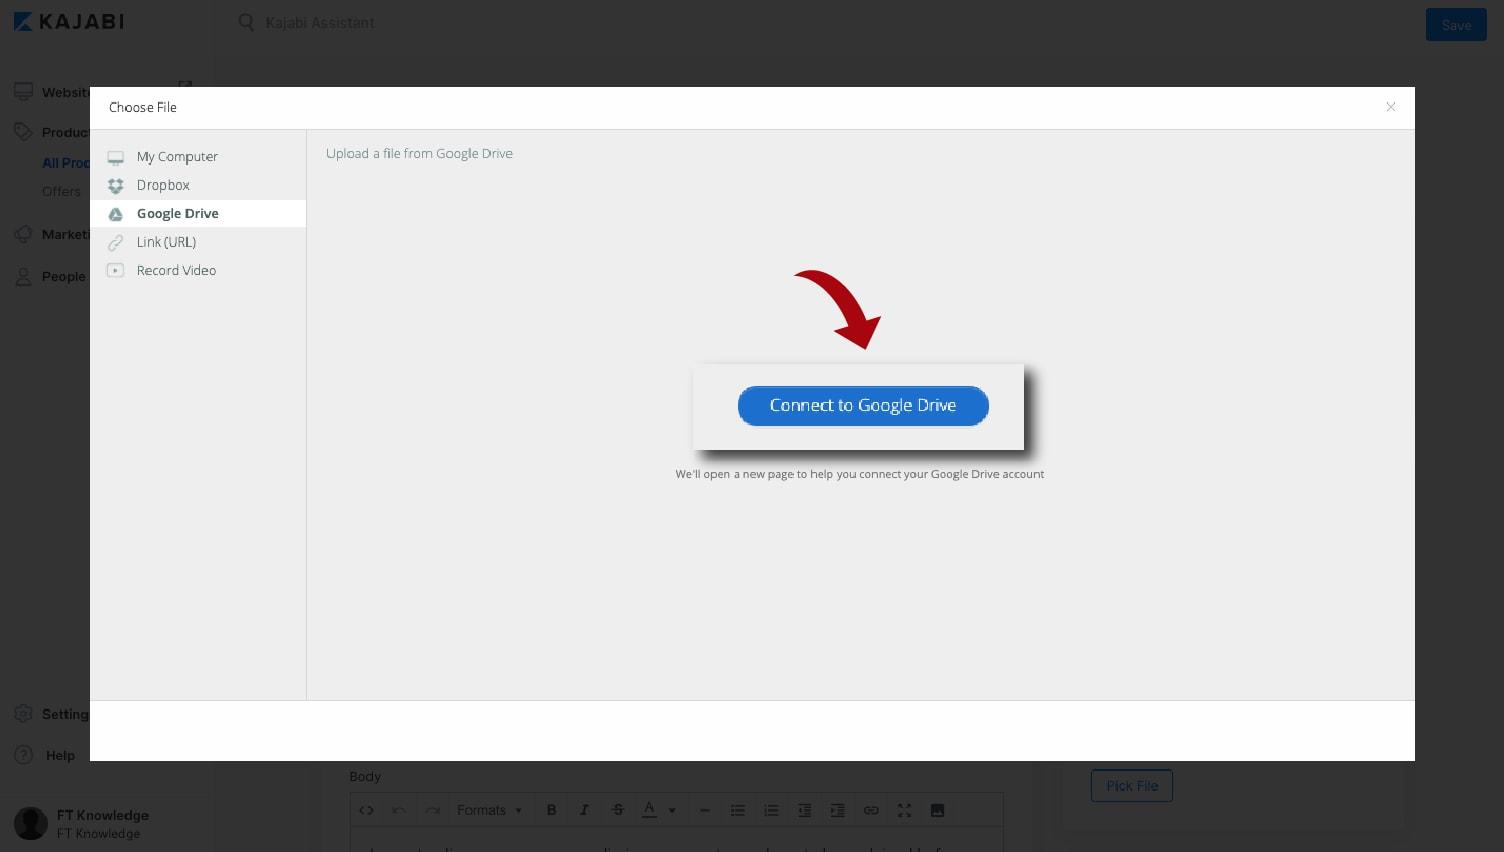 Kajabi Content and Course Creation (Google Drive)